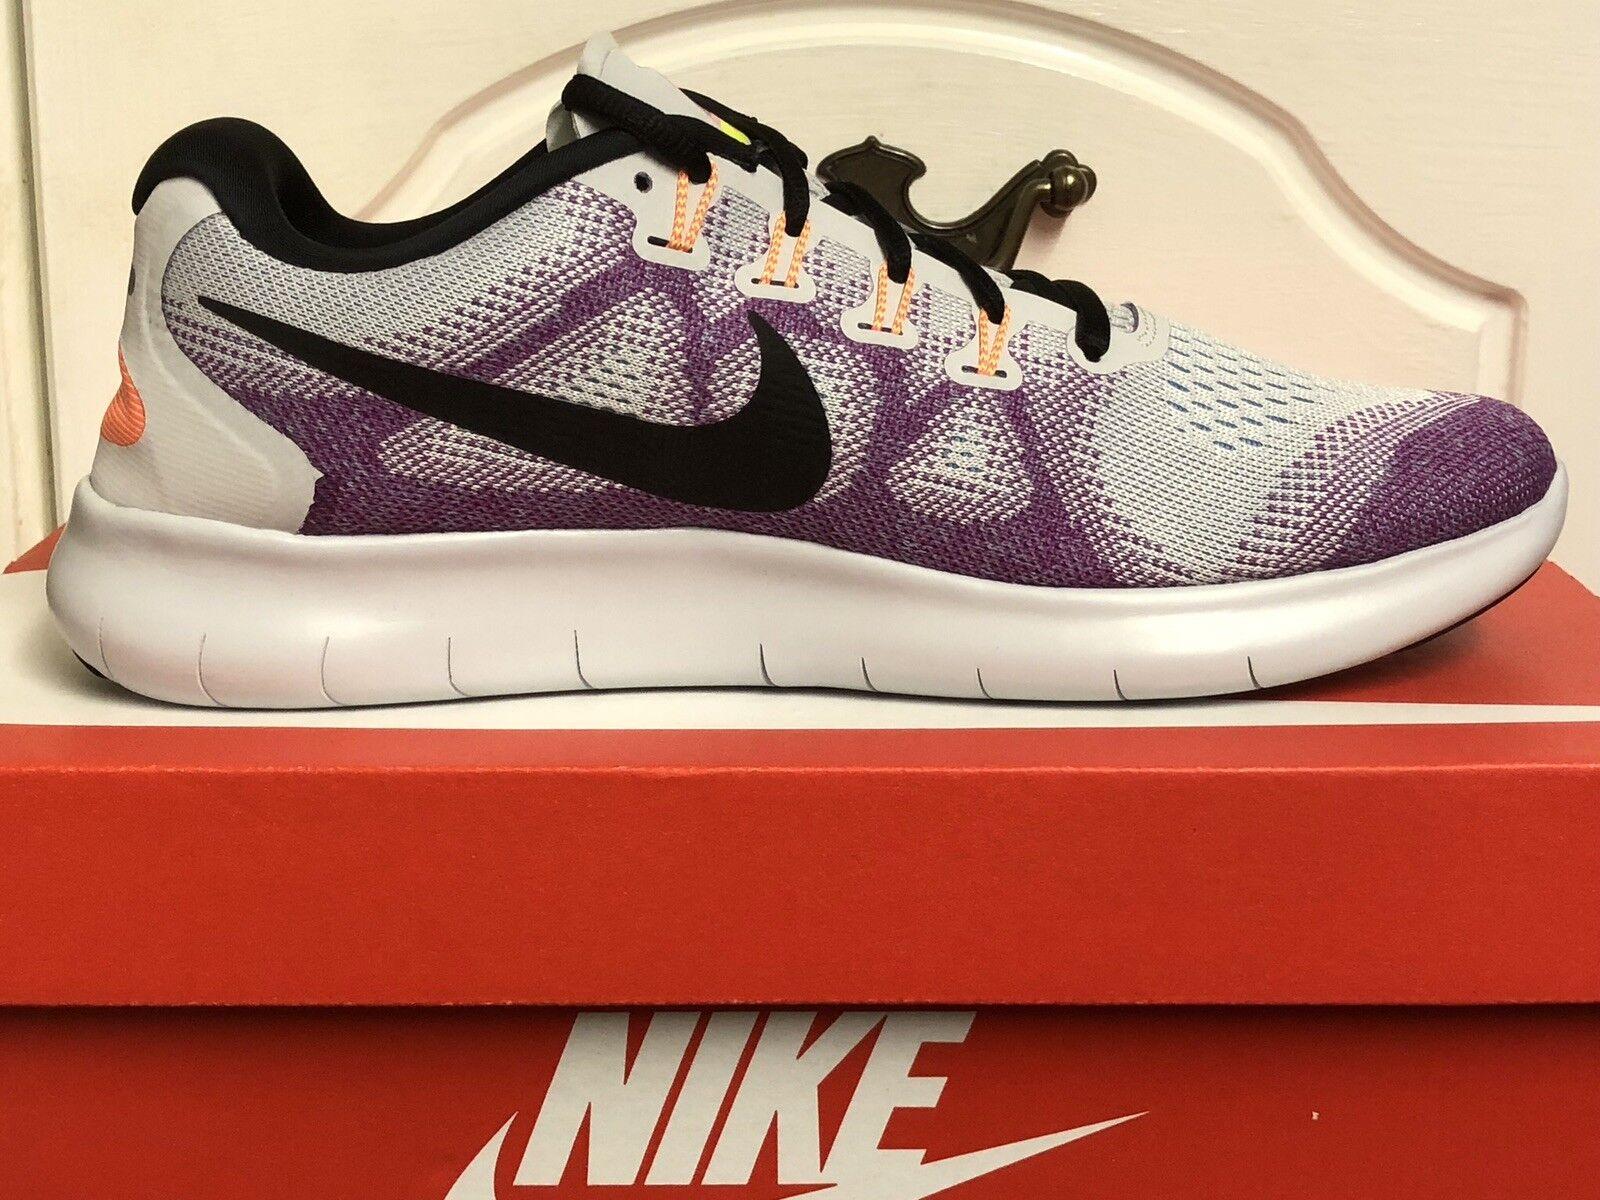 Nike Free Free Free Run movimento Flyknit Linea Donna Scarpe Ginnastica EUR 42 US 10 e0d0d4